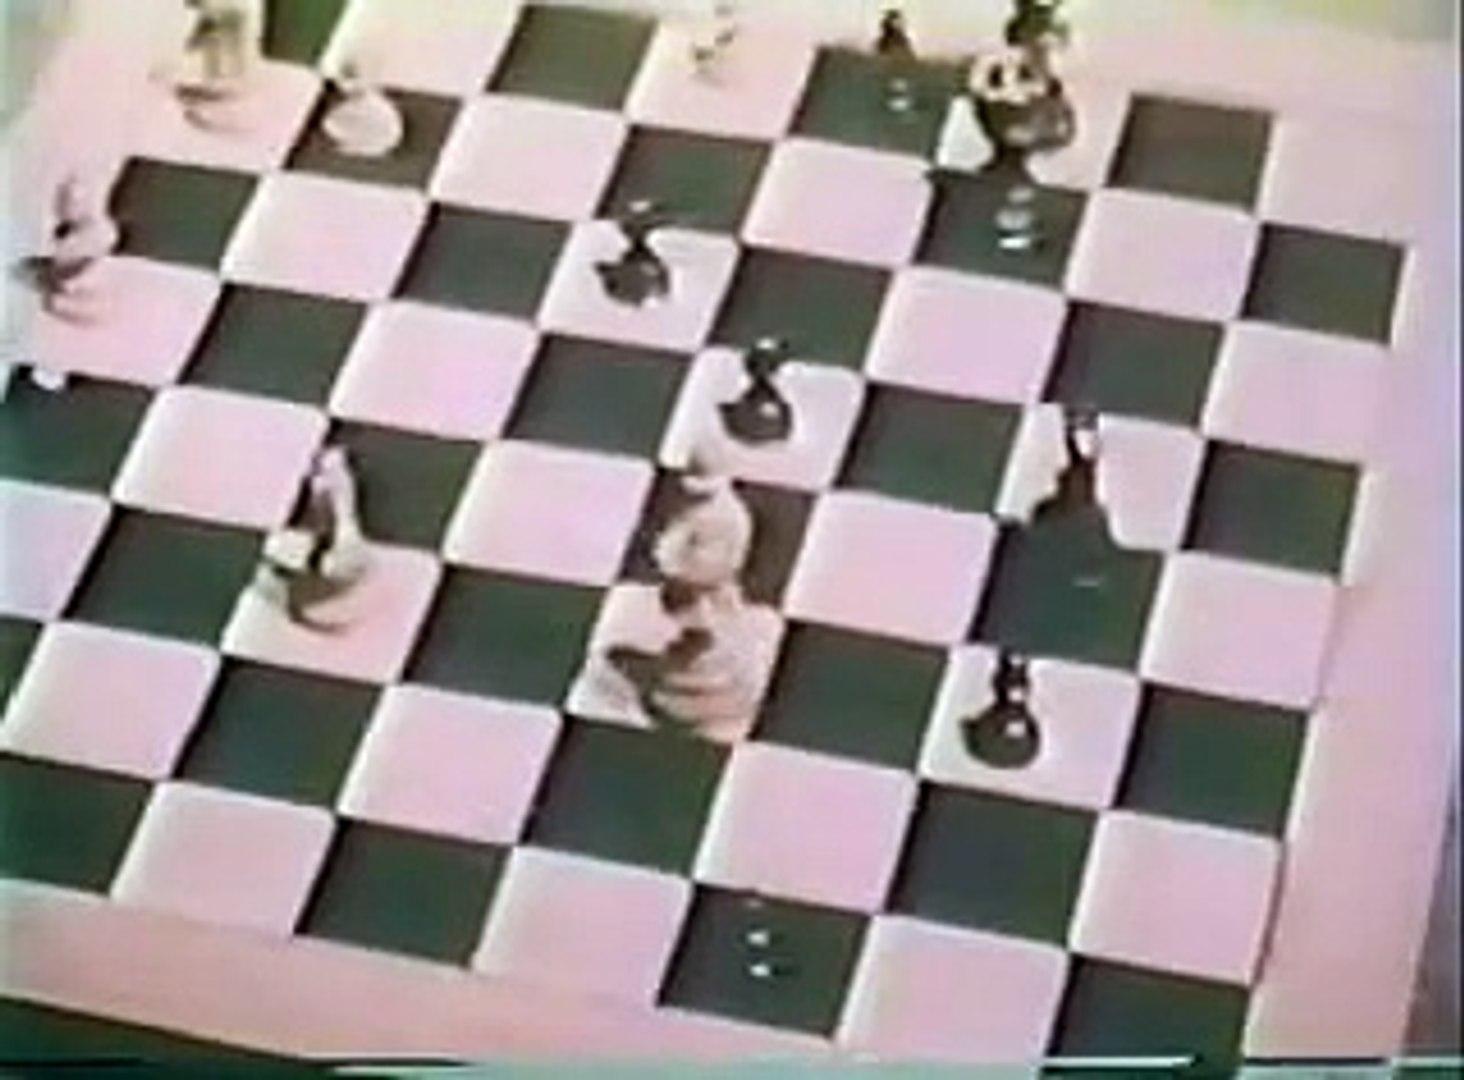 8 X 8: A Chess Sonata in 8 Movements Trailer